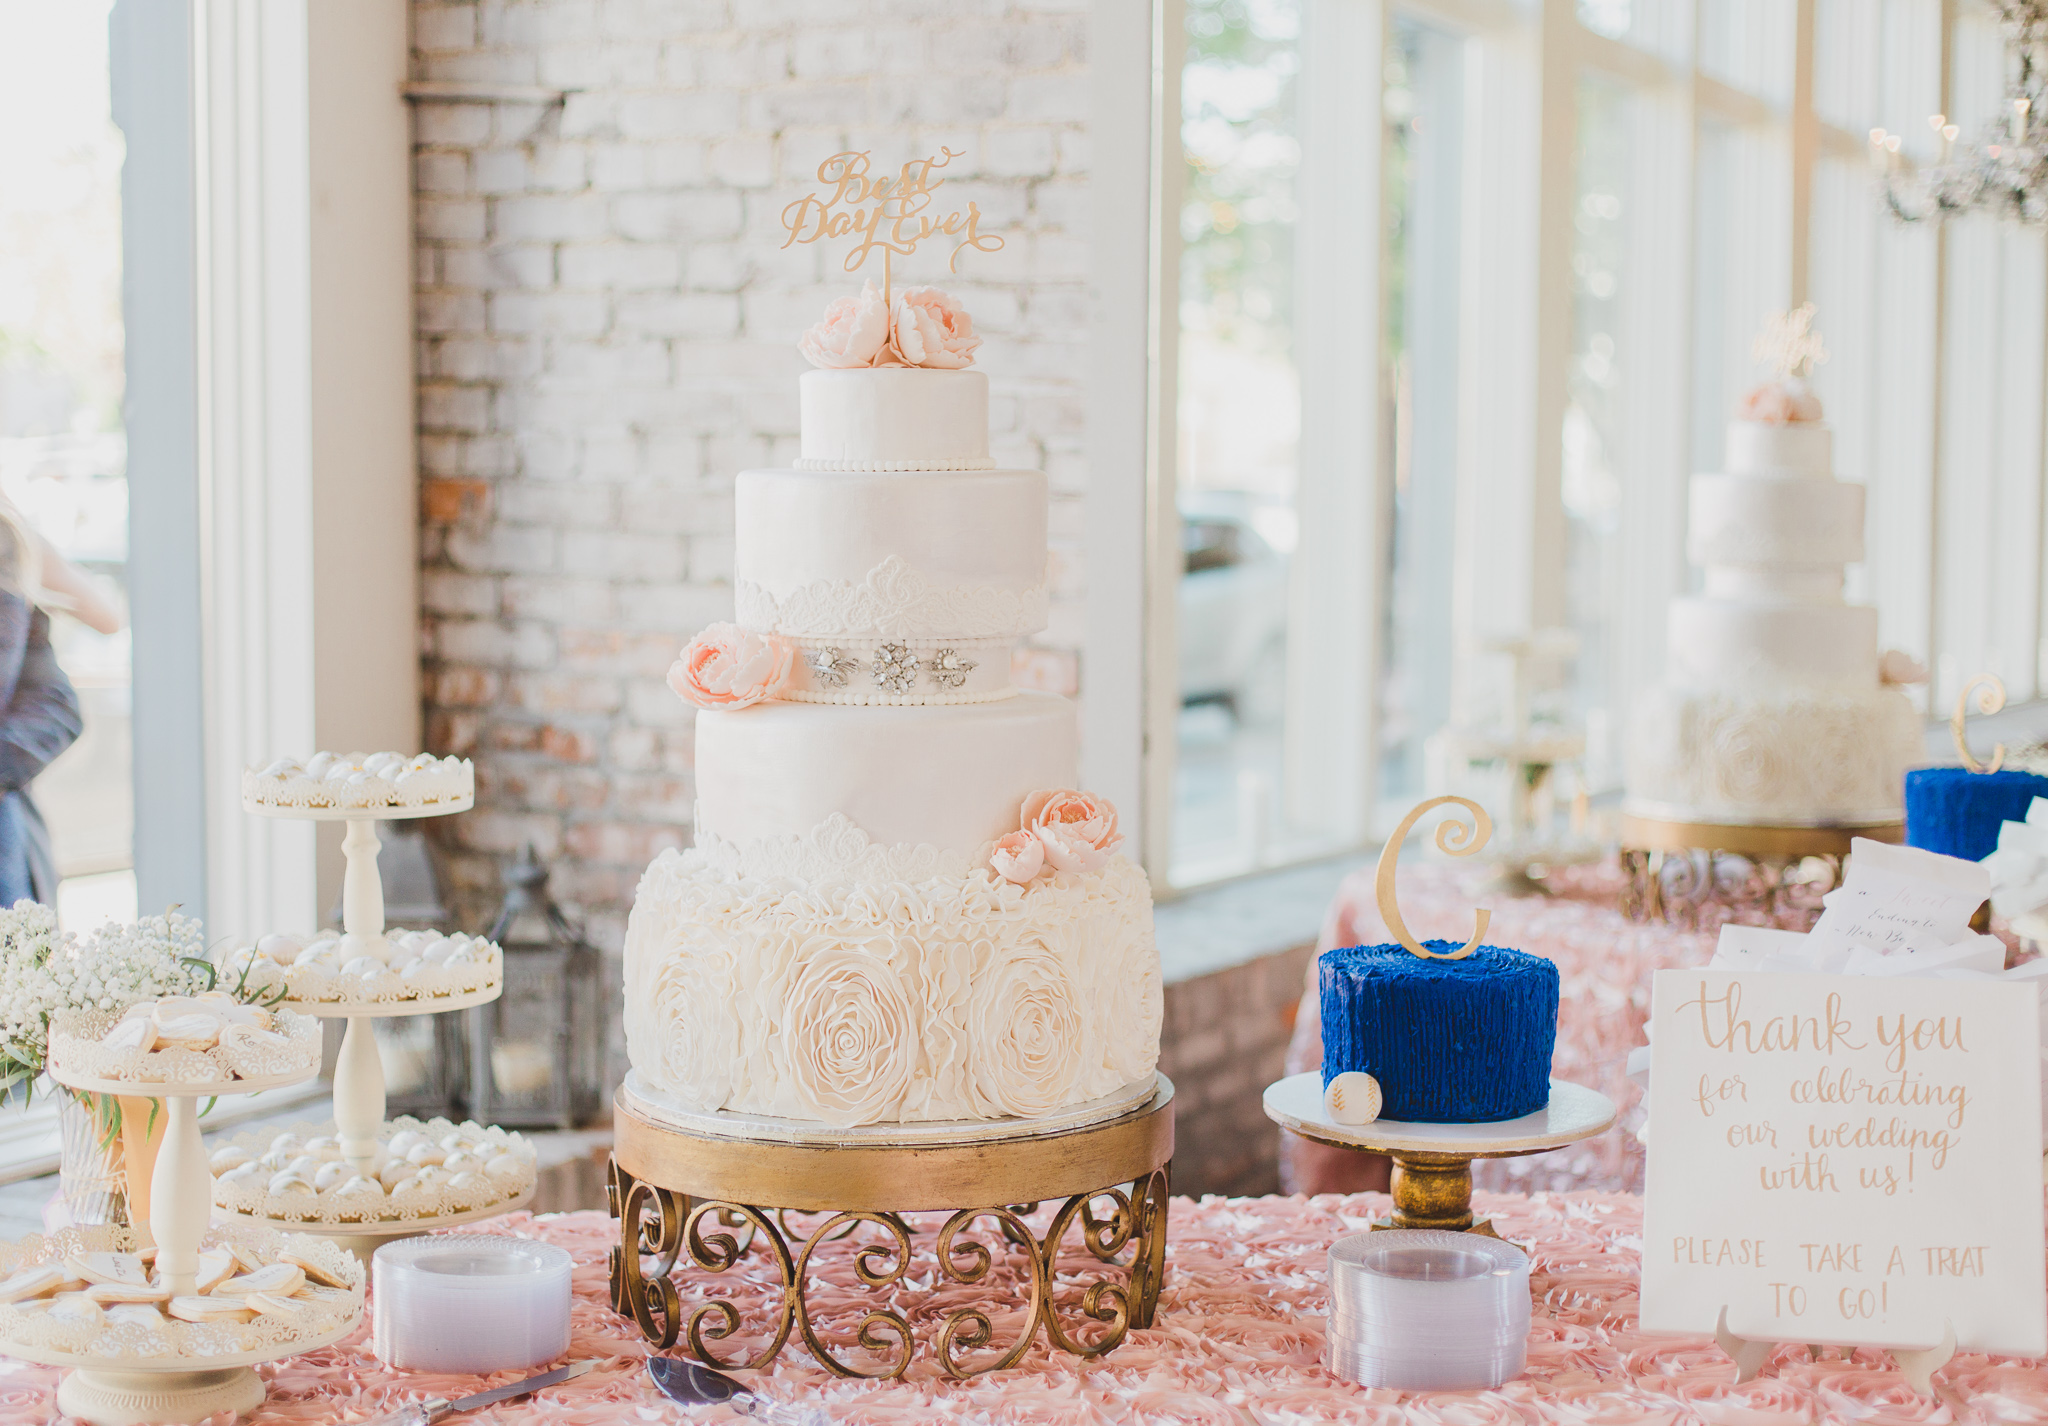 5 layer cake in 5 eleven wedding venue in pensacola